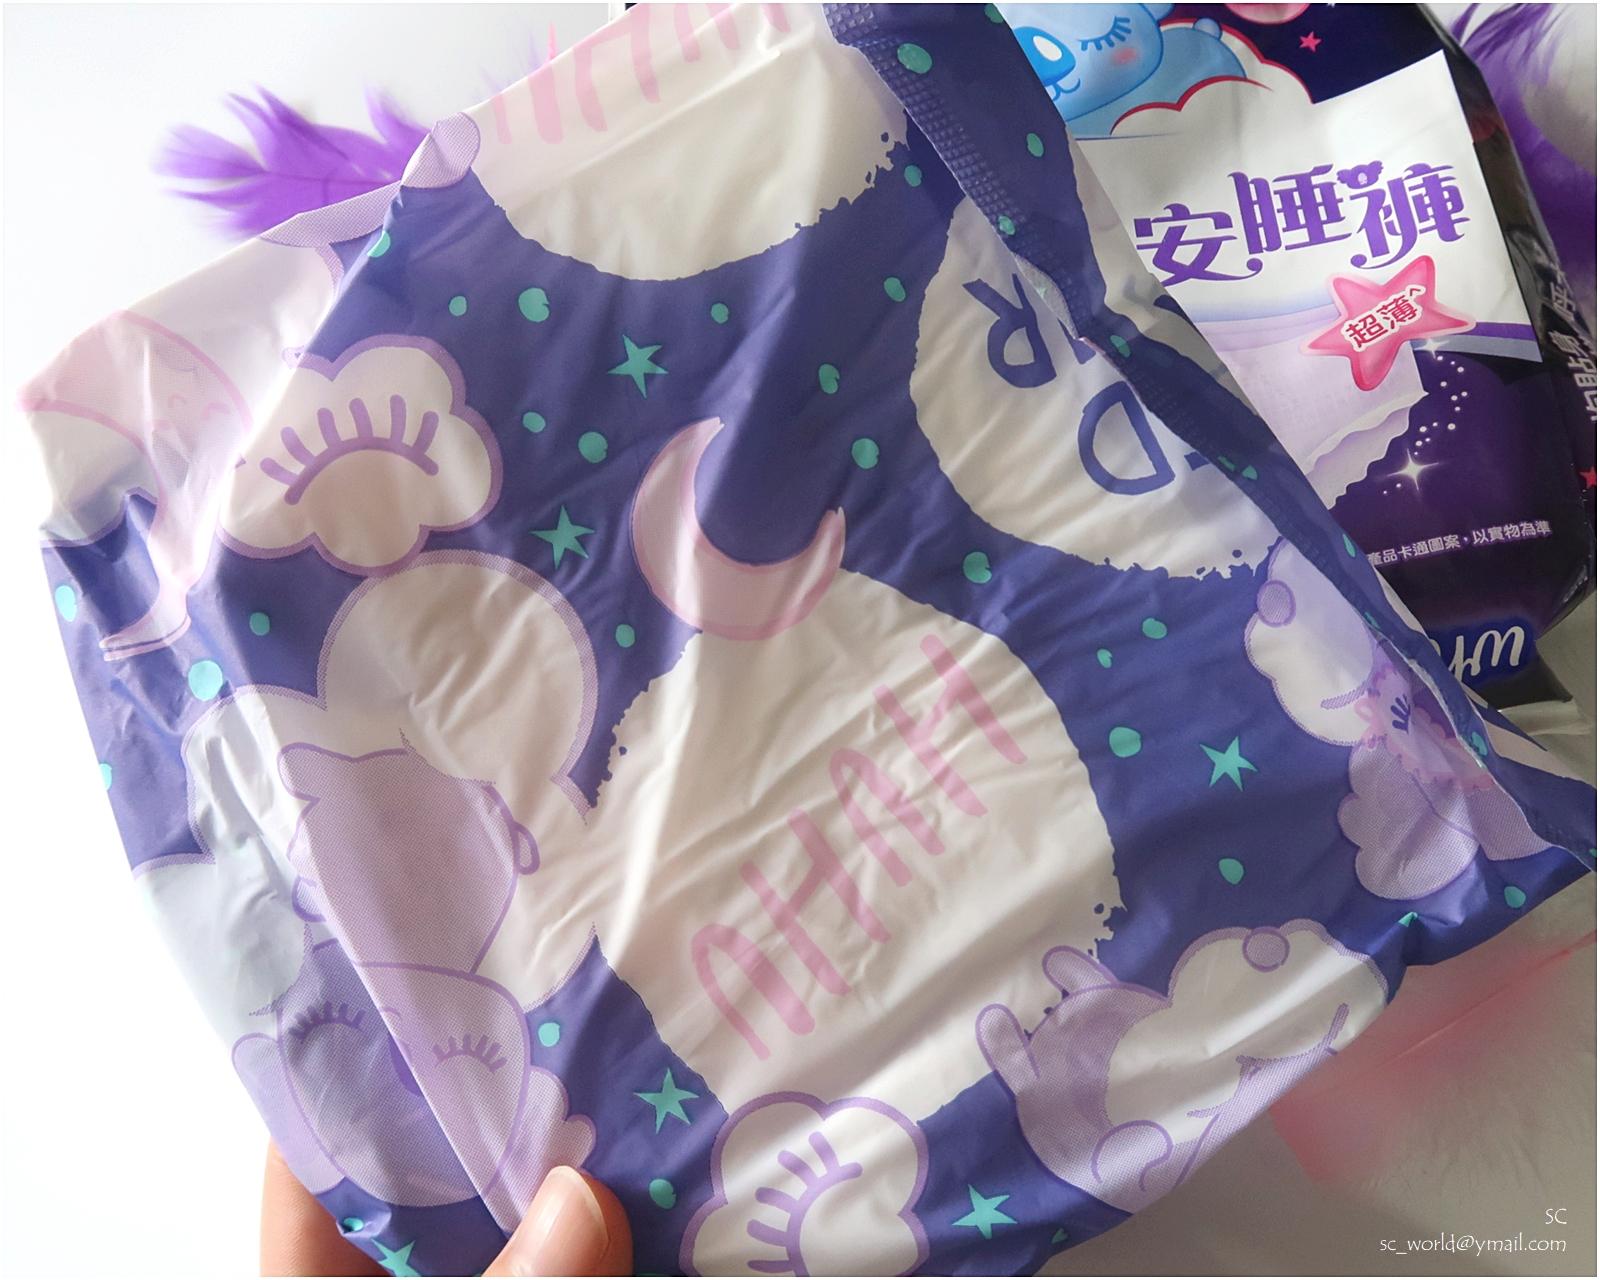 » Whisper Pure Skin 安睡褲 安心一睡到天明 » 笑一笑。世界太美妙!!